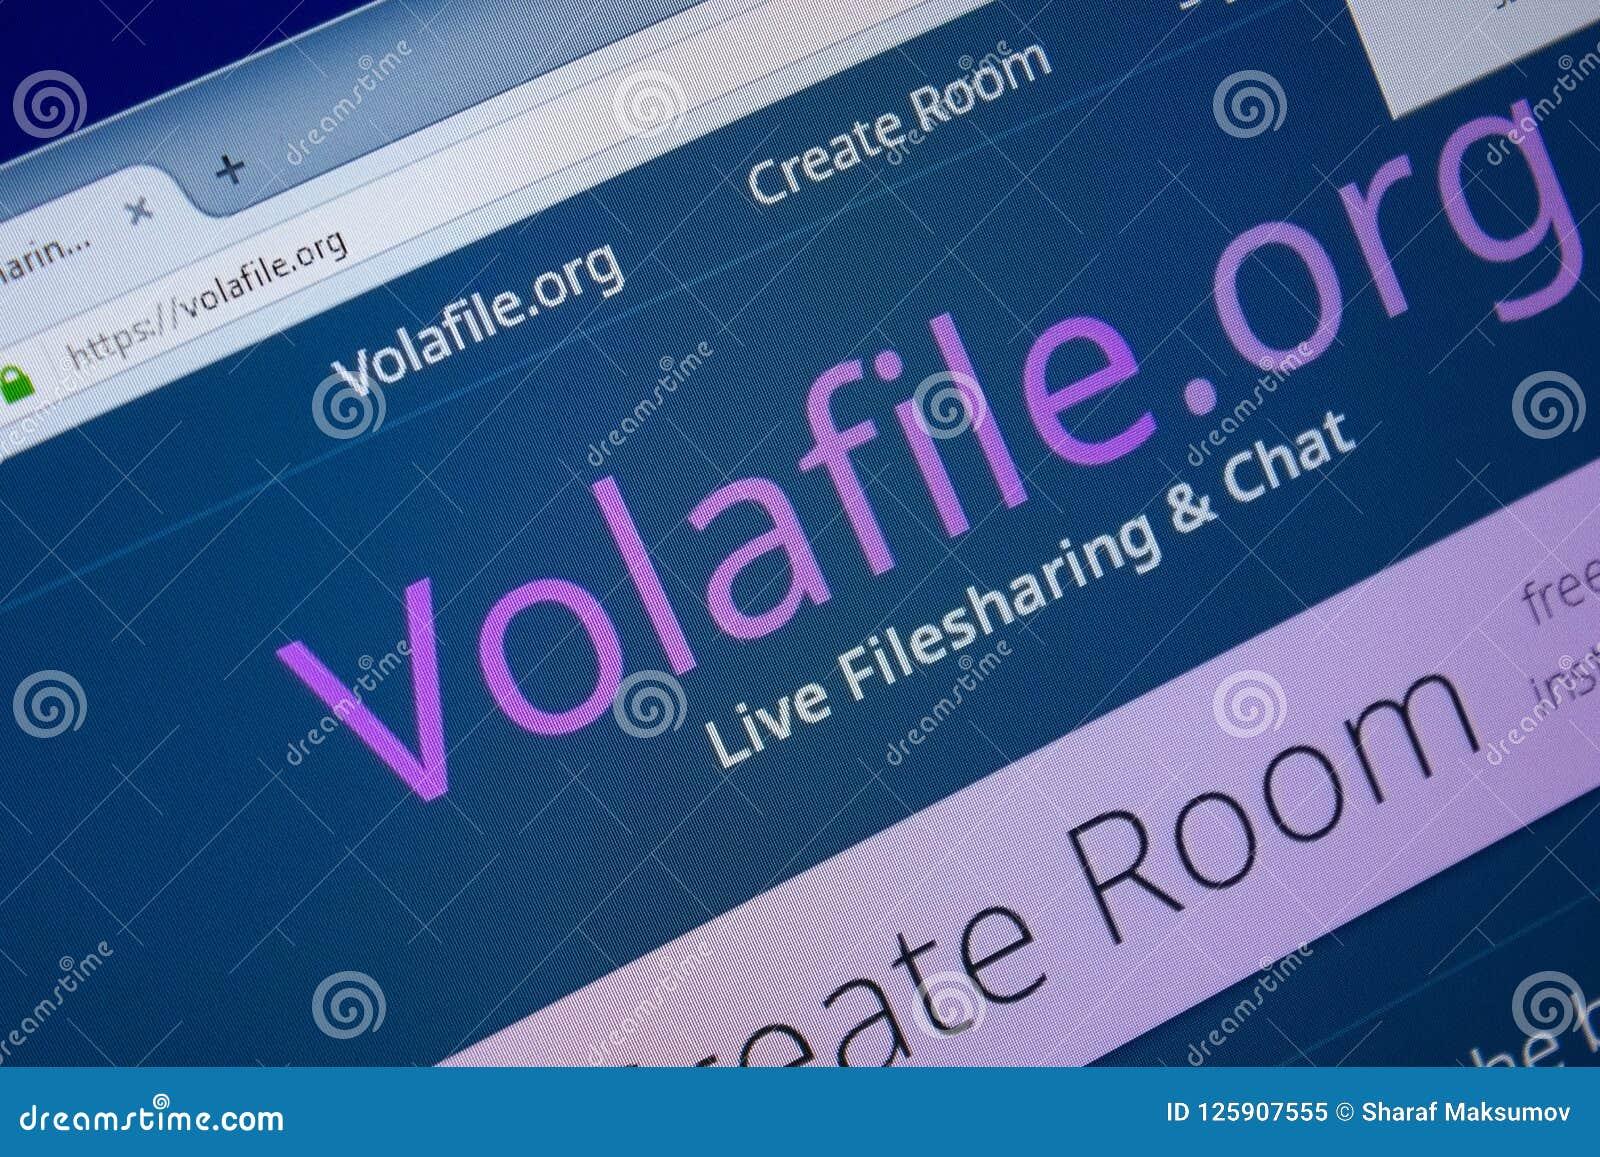 Volafile Volafile: Create